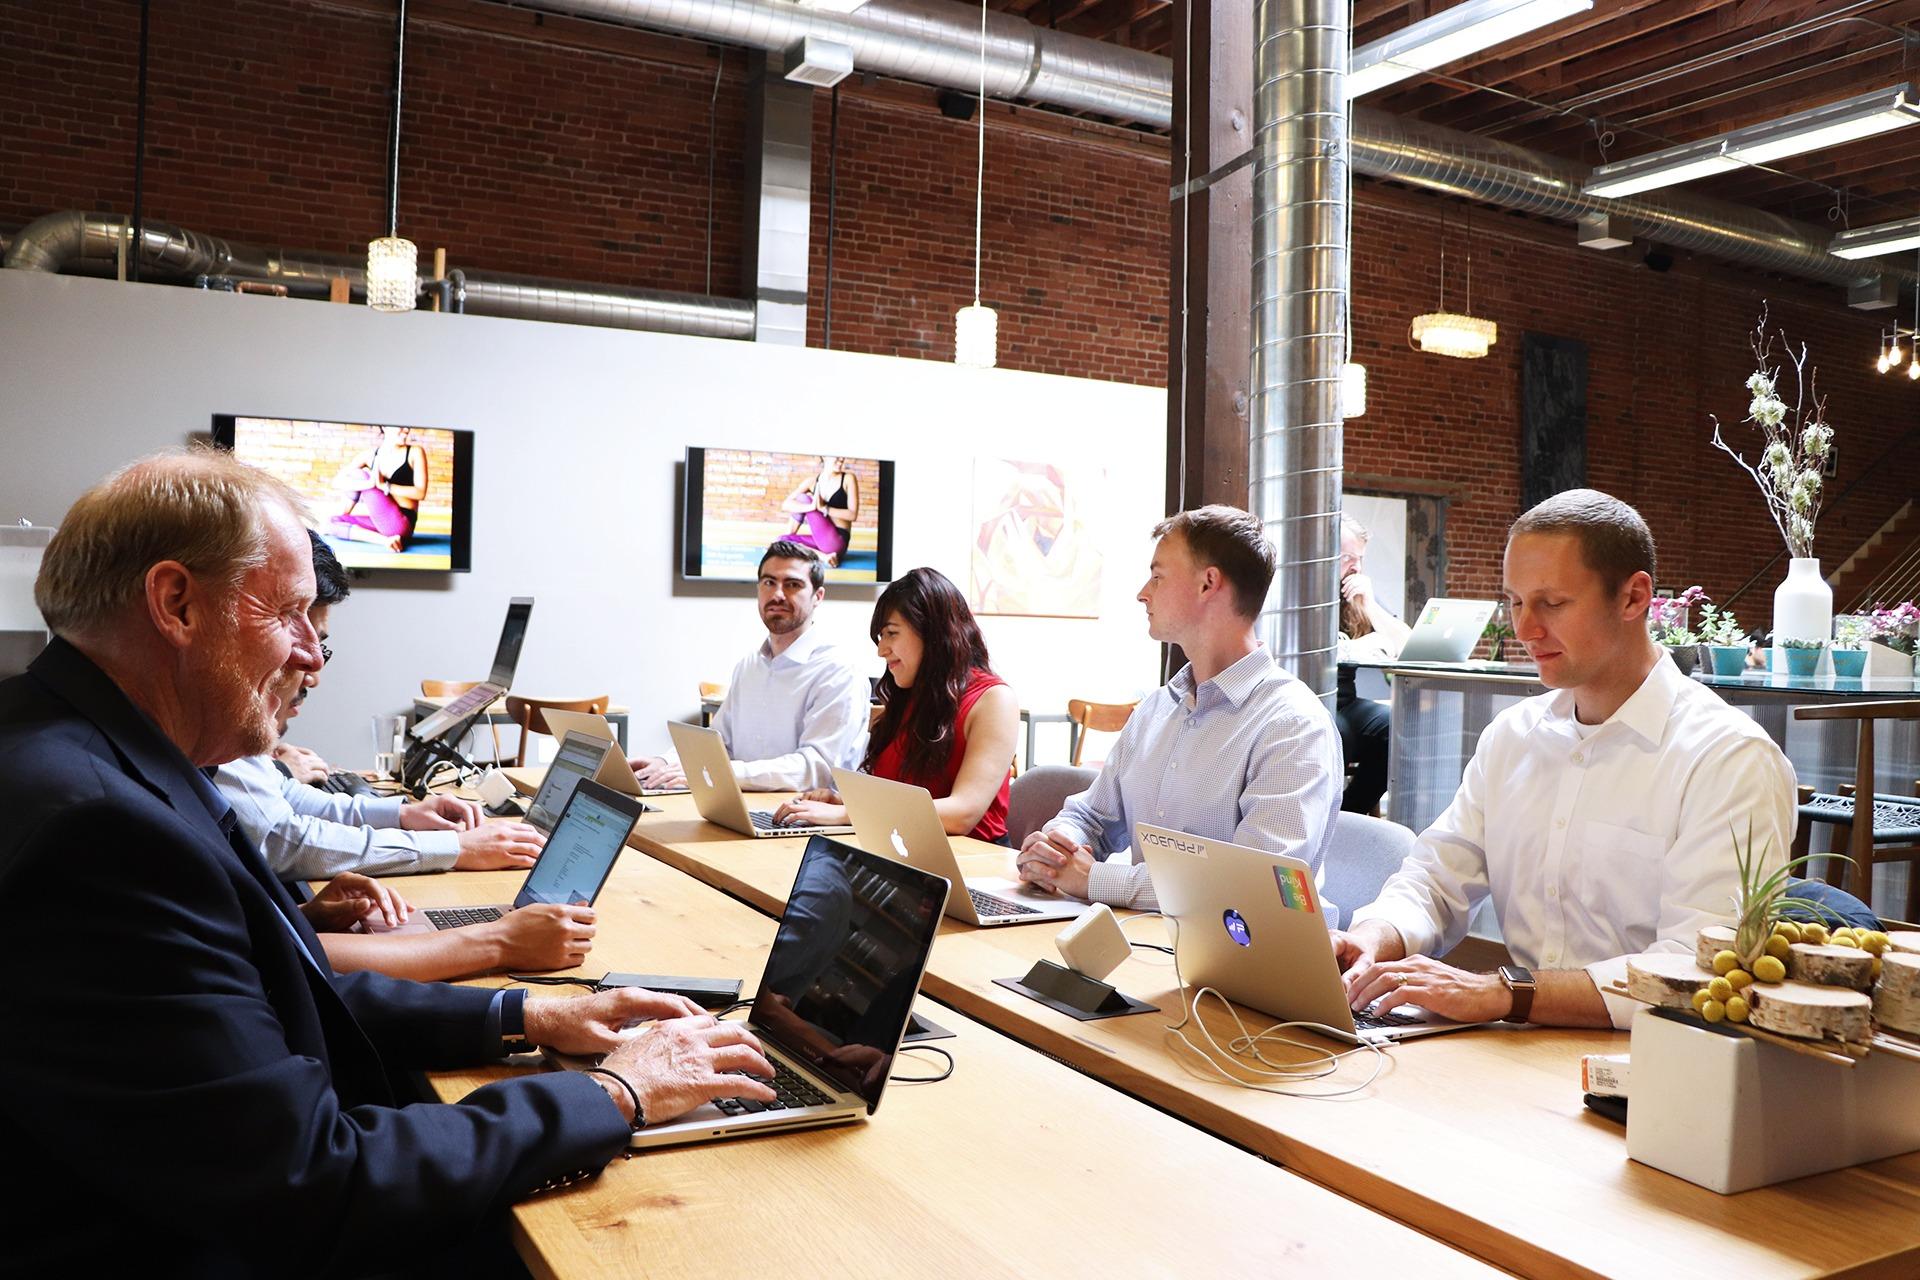 Is Adobe Campaign HIPAA Compliant?